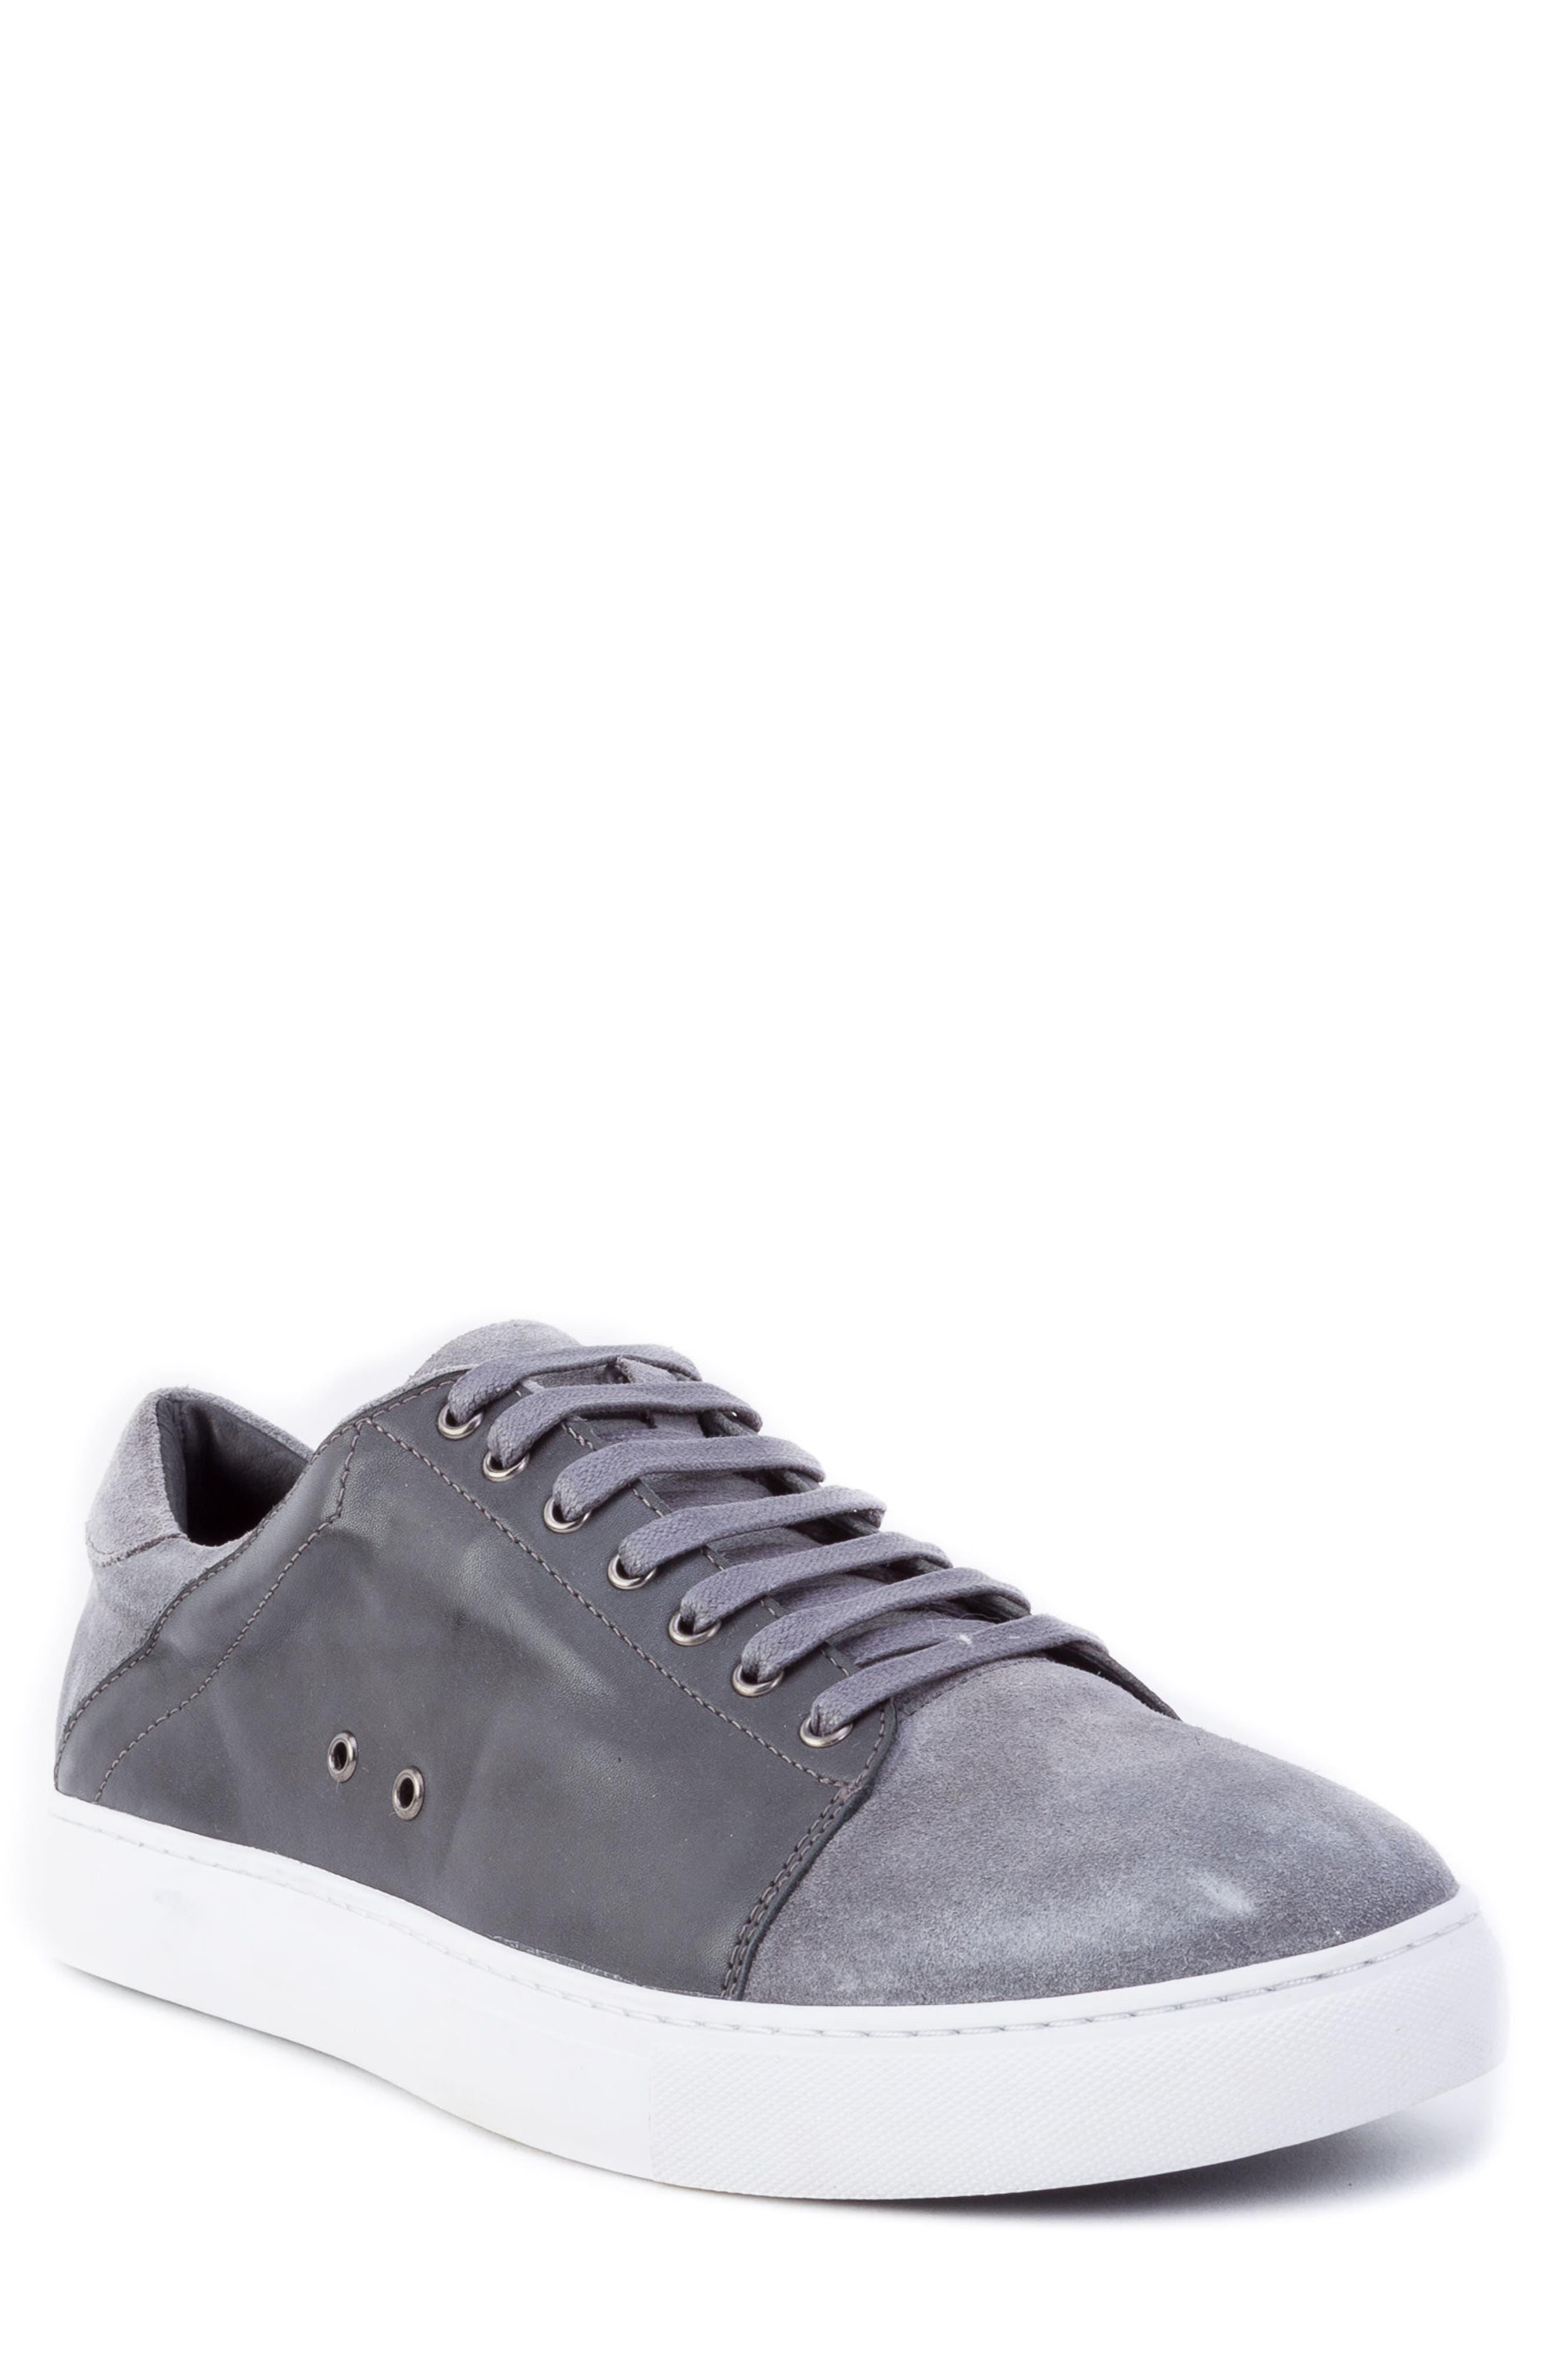 Zanzara Record Low Top Sneaker, Grey